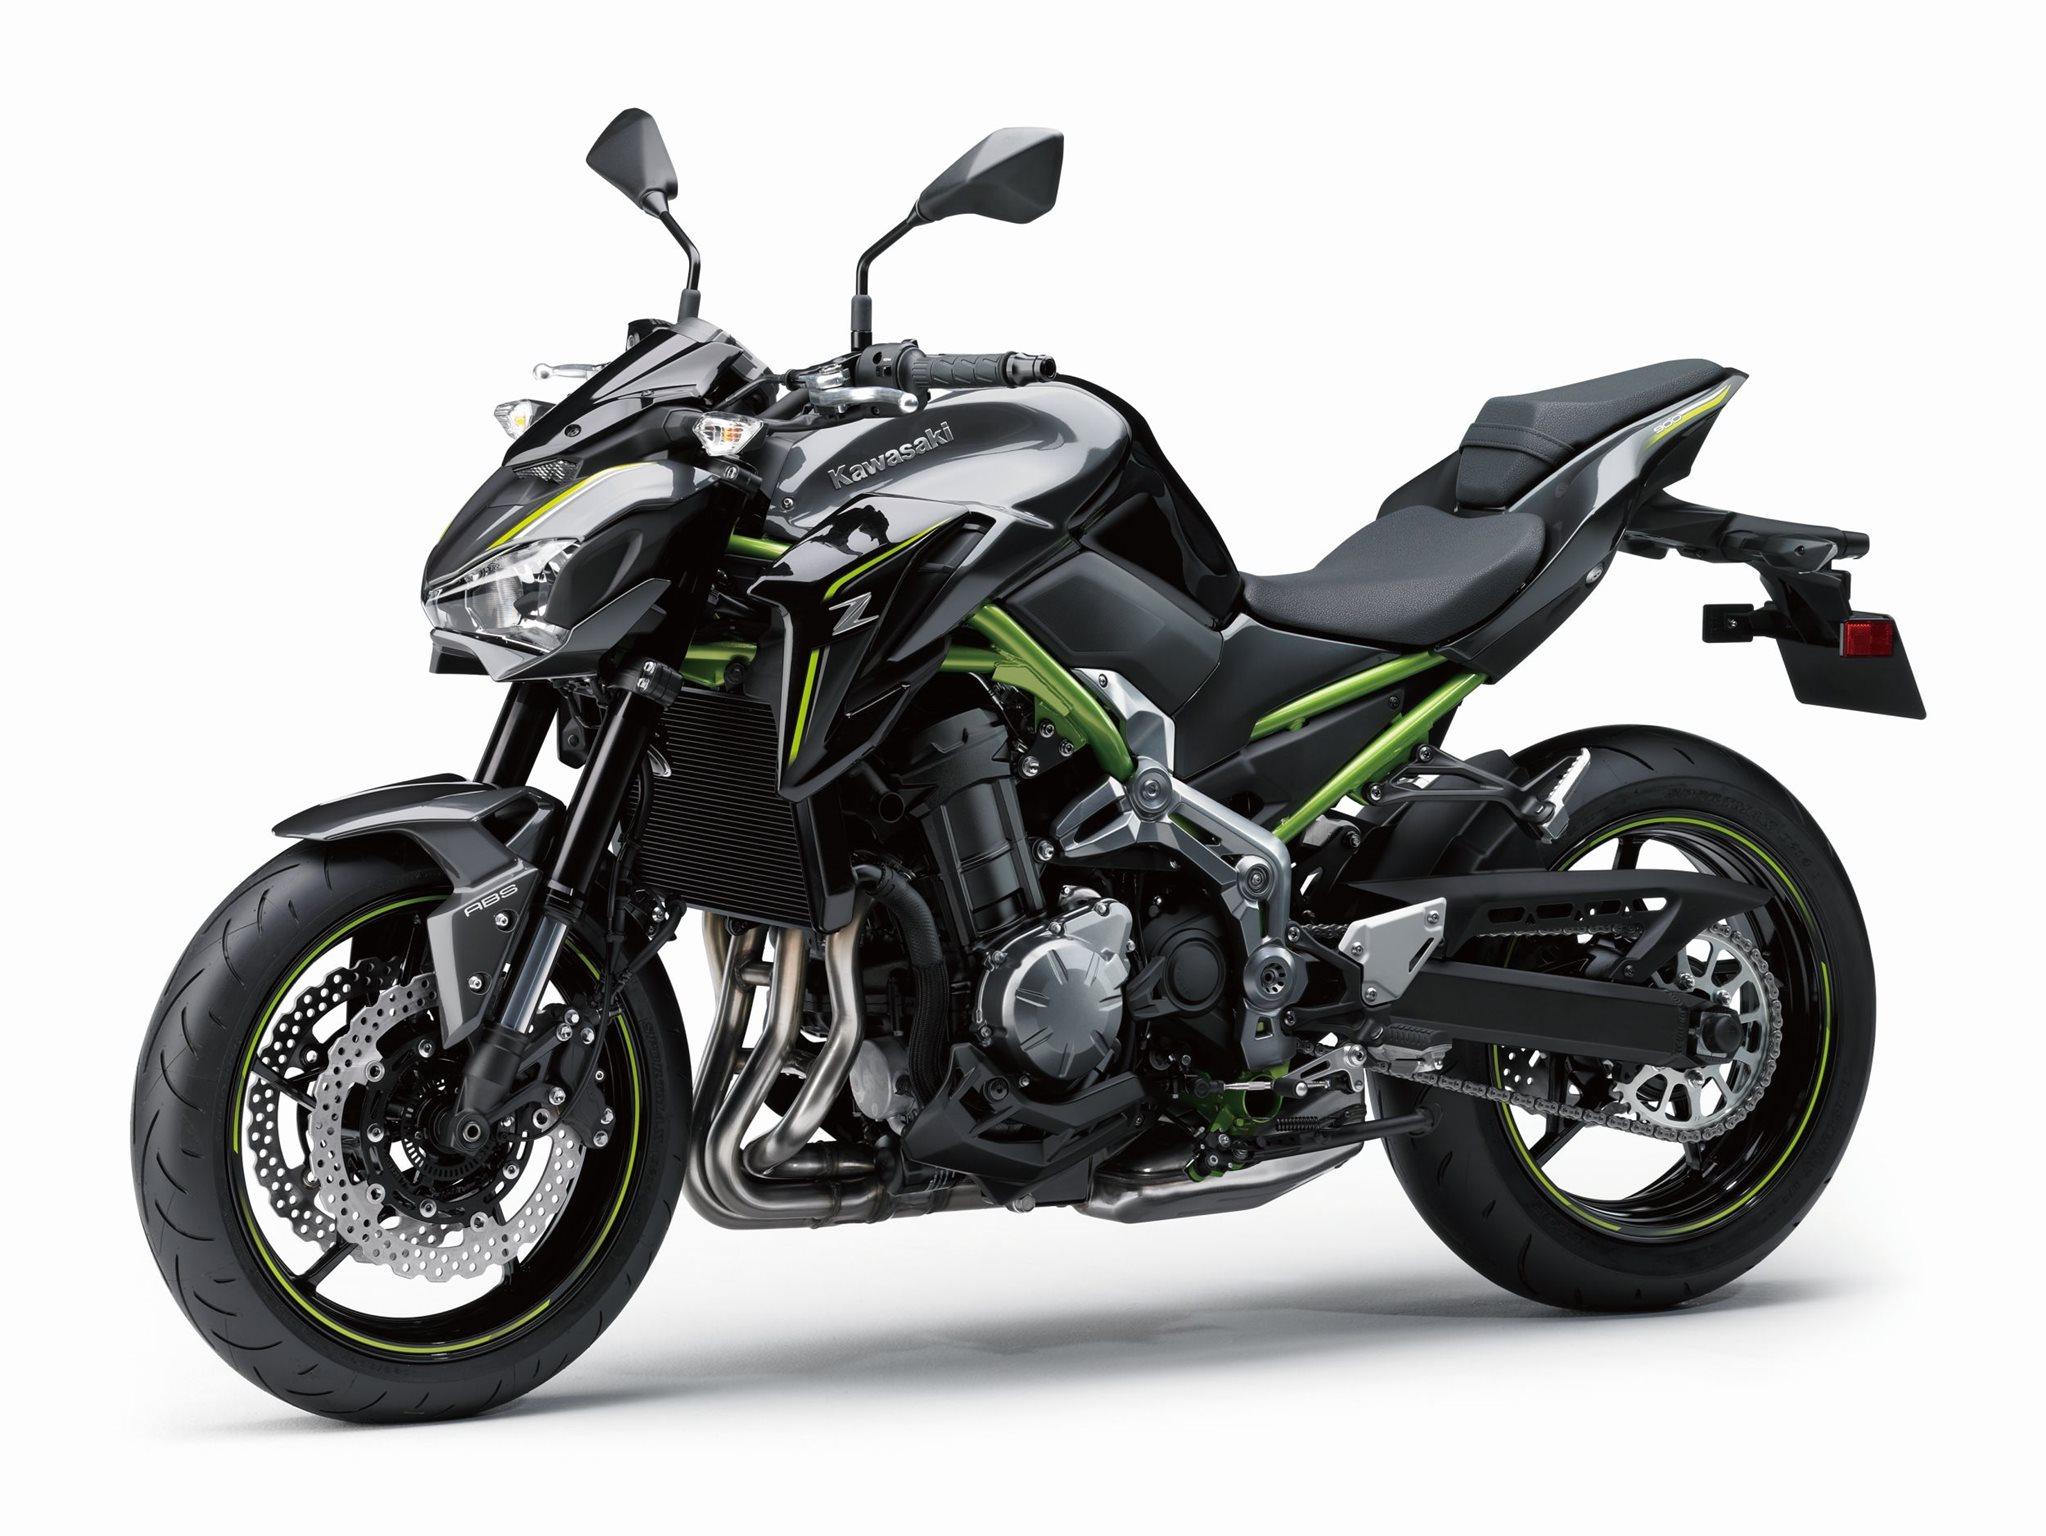 Kawasaki Z 900 RS Special Custom Bike   Louis motorcycle